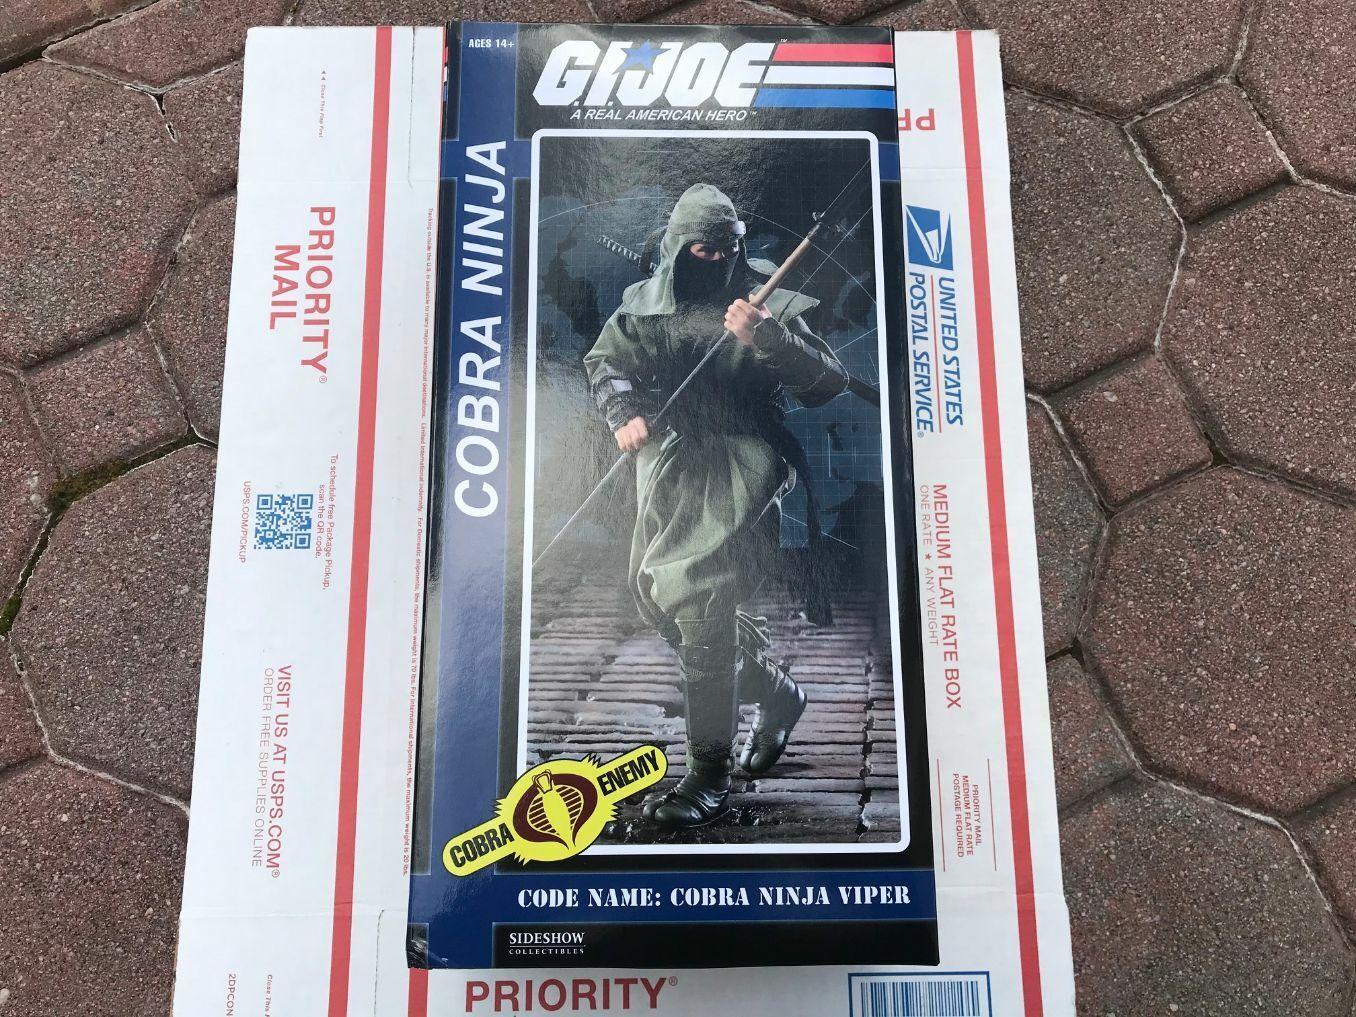 Sideshow Collectibles Gi Joe Cobra Ninja Viper 1/6 Scale Figure SDCC Exclusive on eBay thumbnail